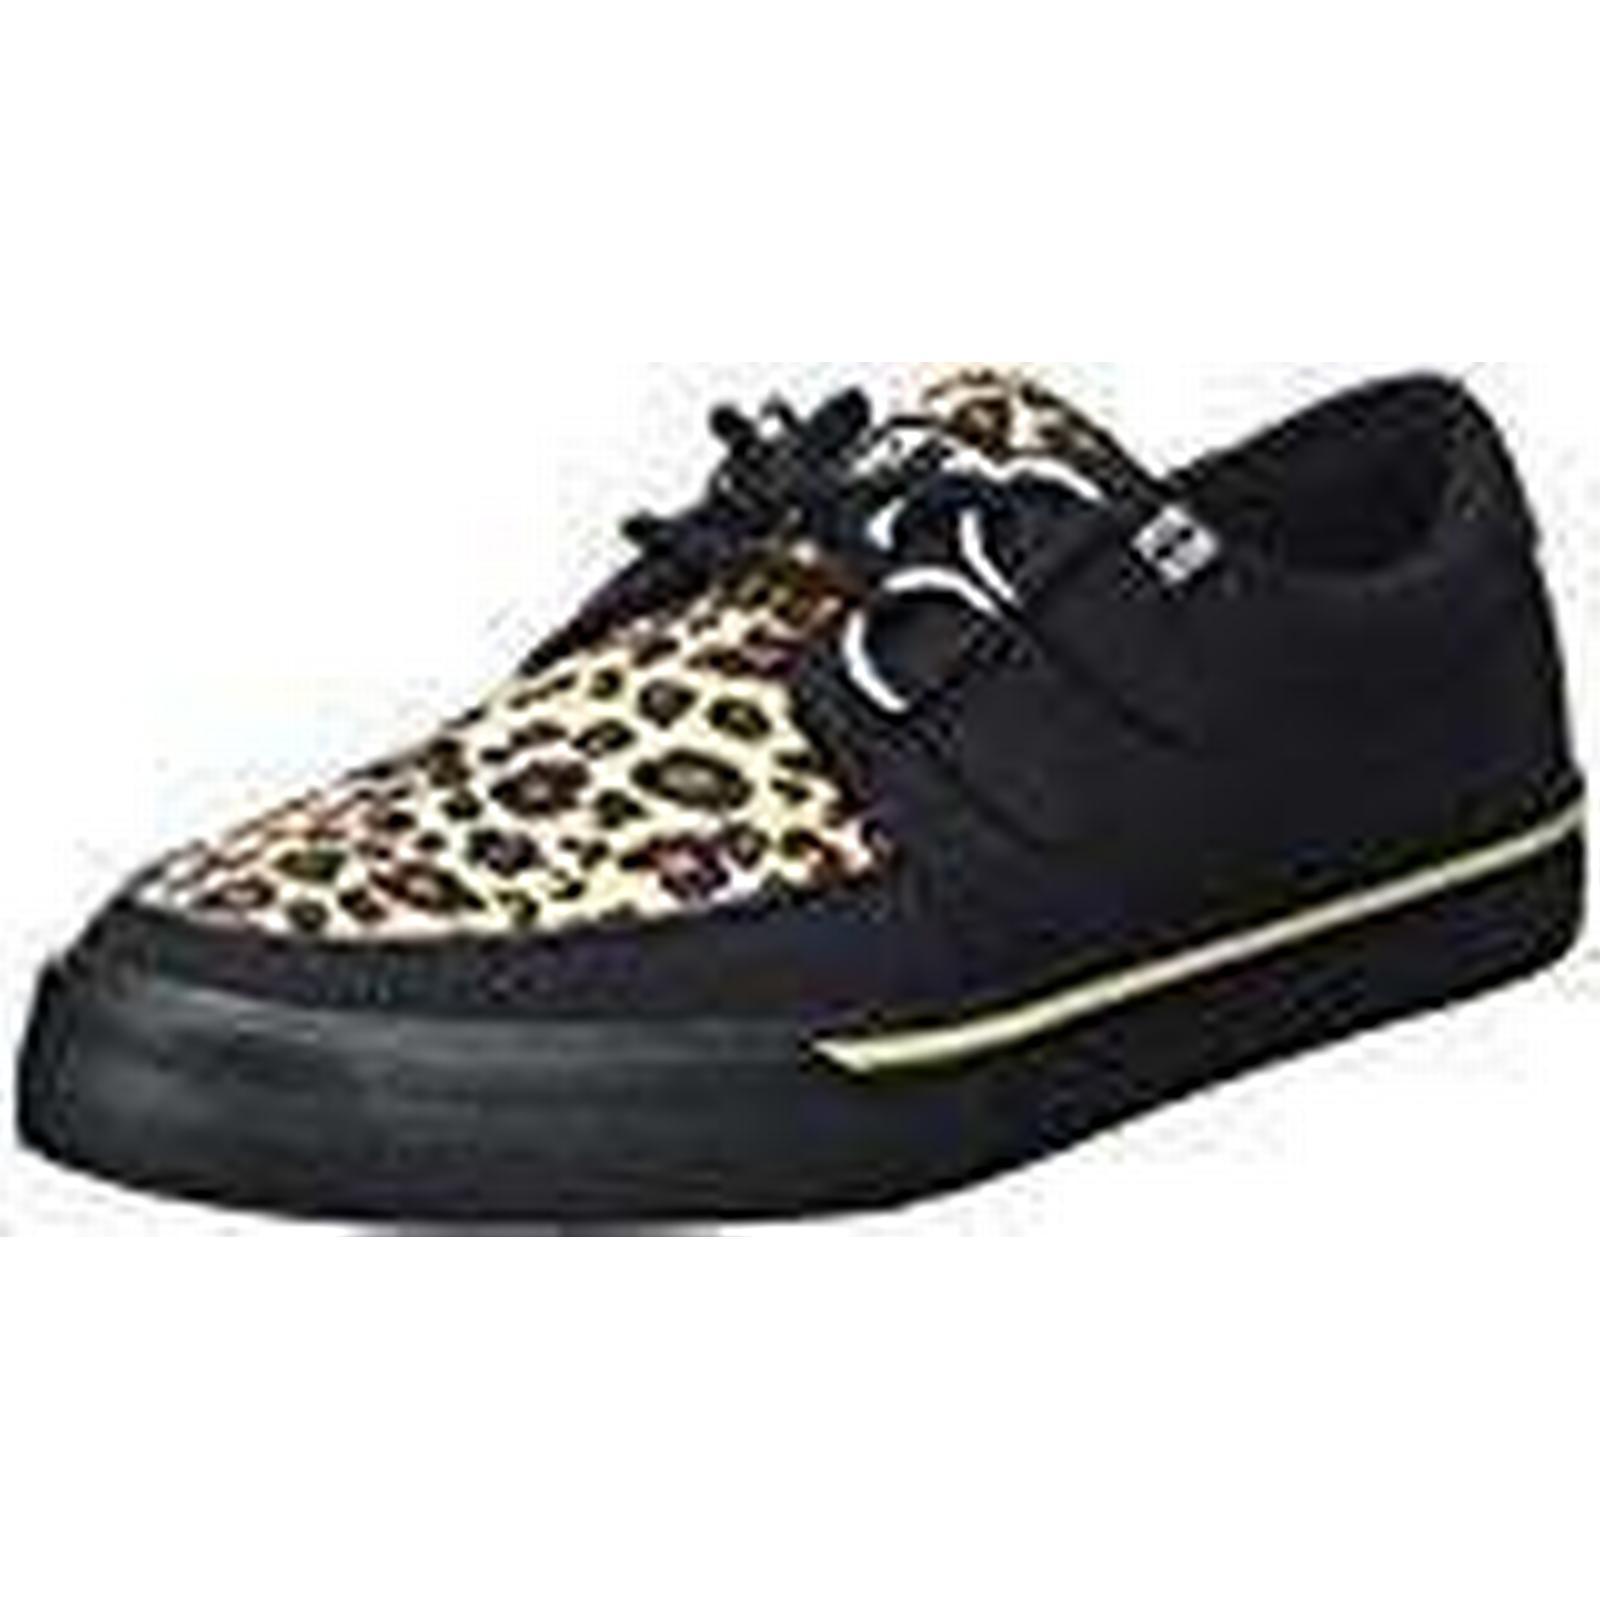 T.U.K. Unisex Adults' VLK D Low Ring Creeper Sneaker Blk/Leopard Low D Black Size: 7 472a69